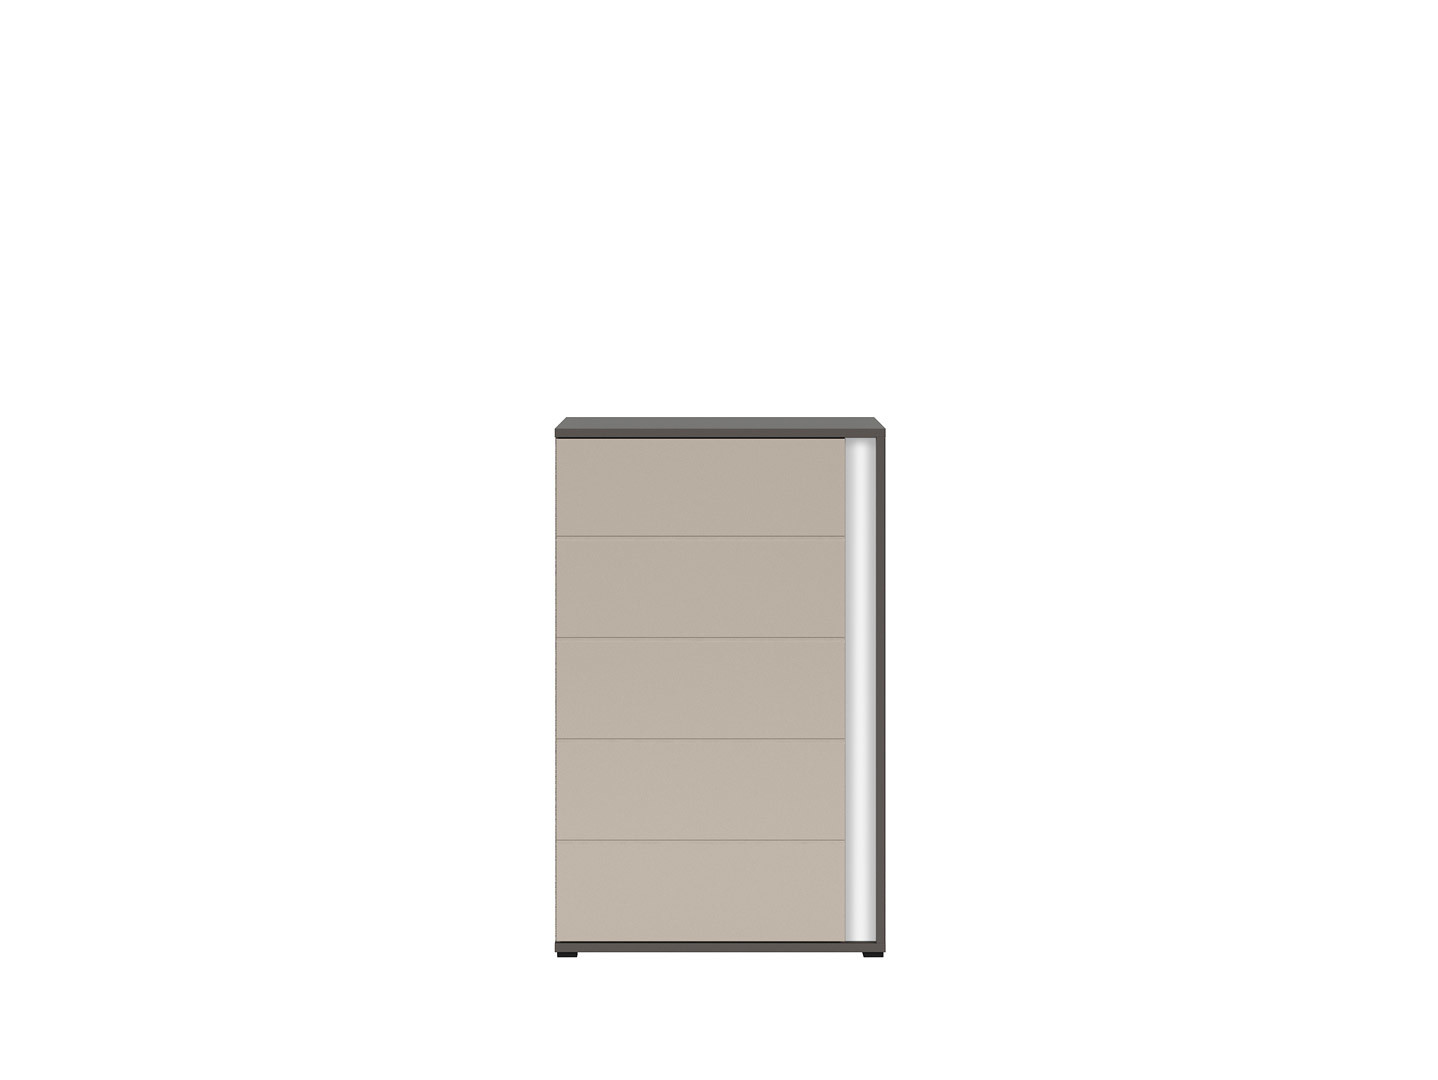 Skrinka GRAPHIC KOM1DL/A sivý wolfram/popiel